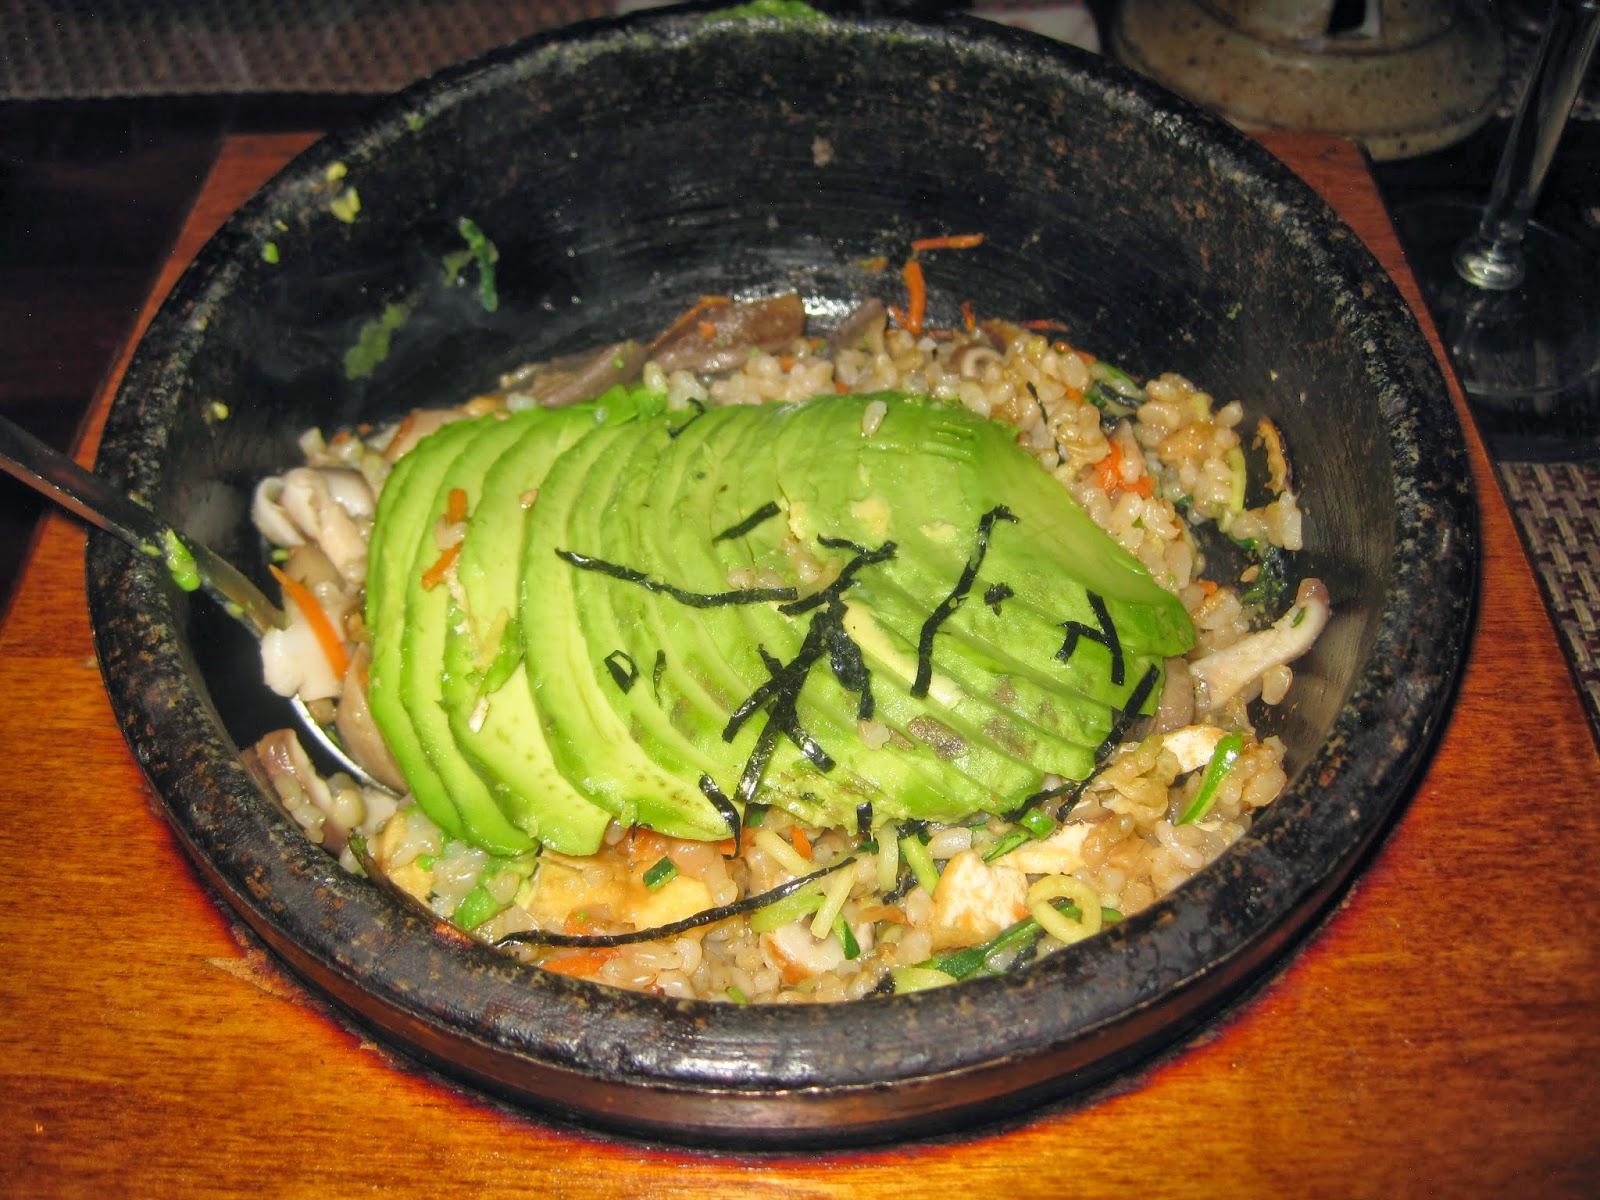 Gluten-Free Vegan Avocado Stone Bowl Rice Hangawi